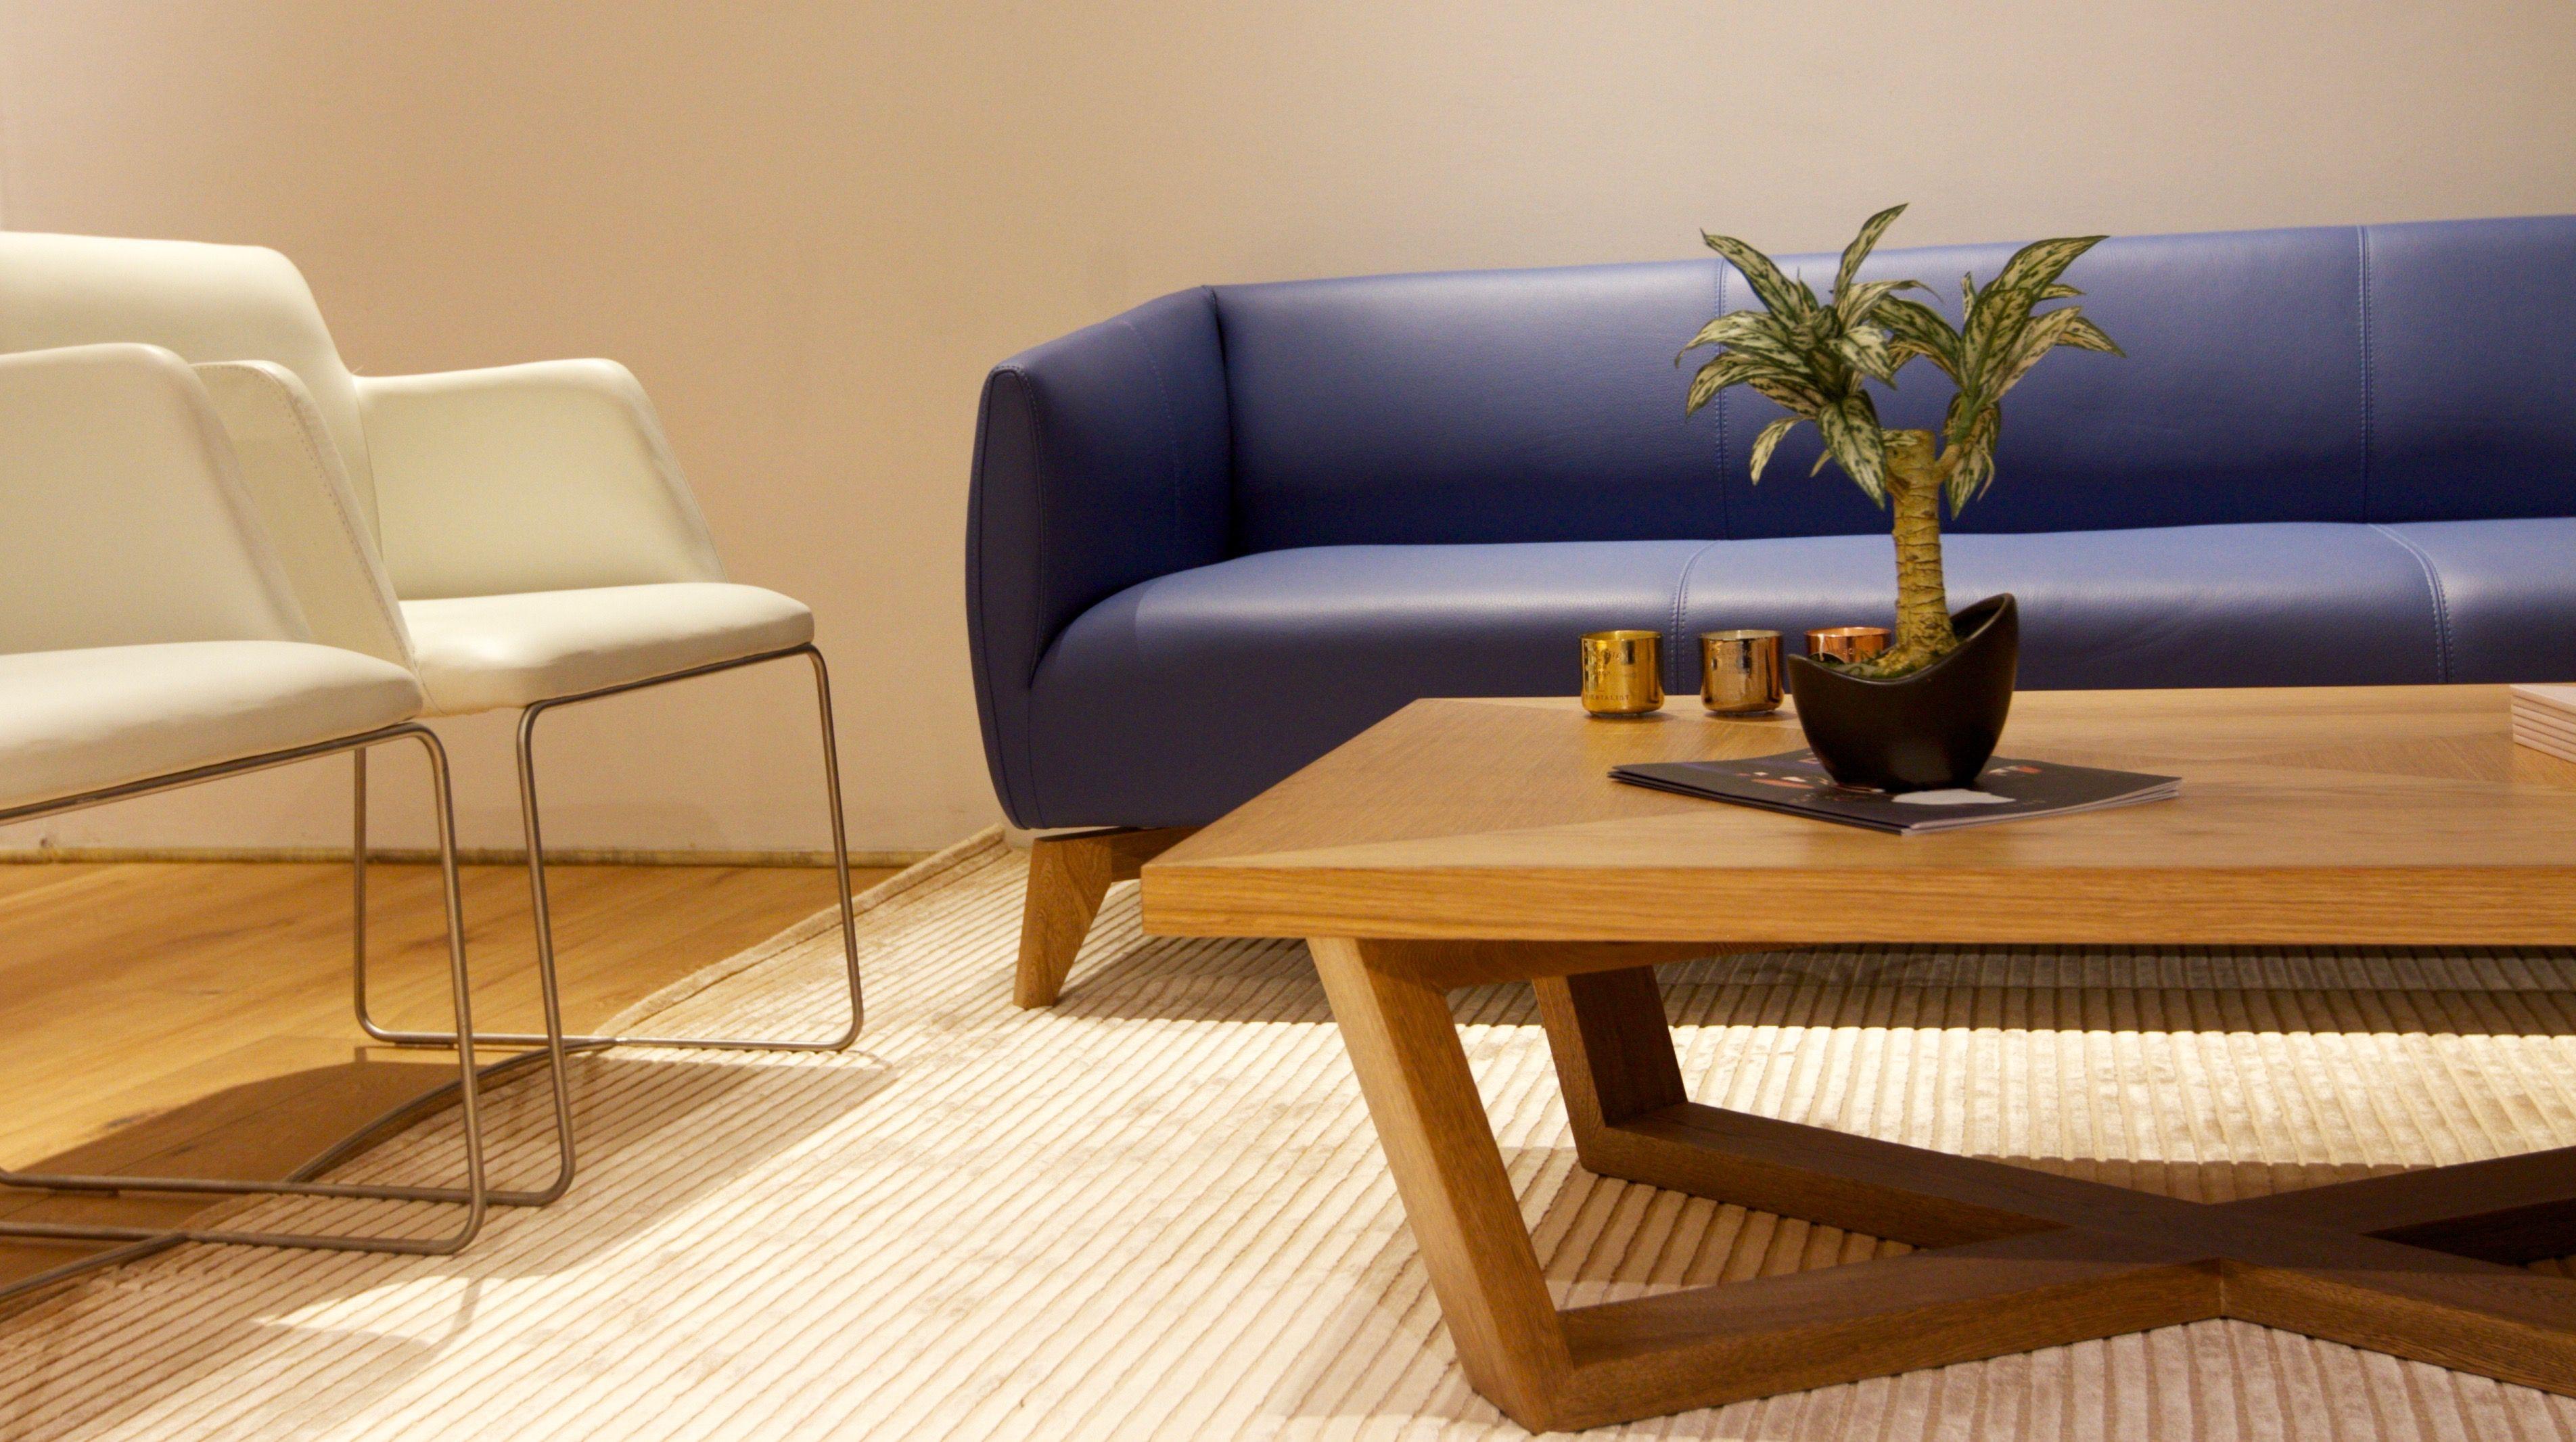 Sofa Indie En Piel Italiana Mastroto Blue Violet Zientte  # Muebles Zientte